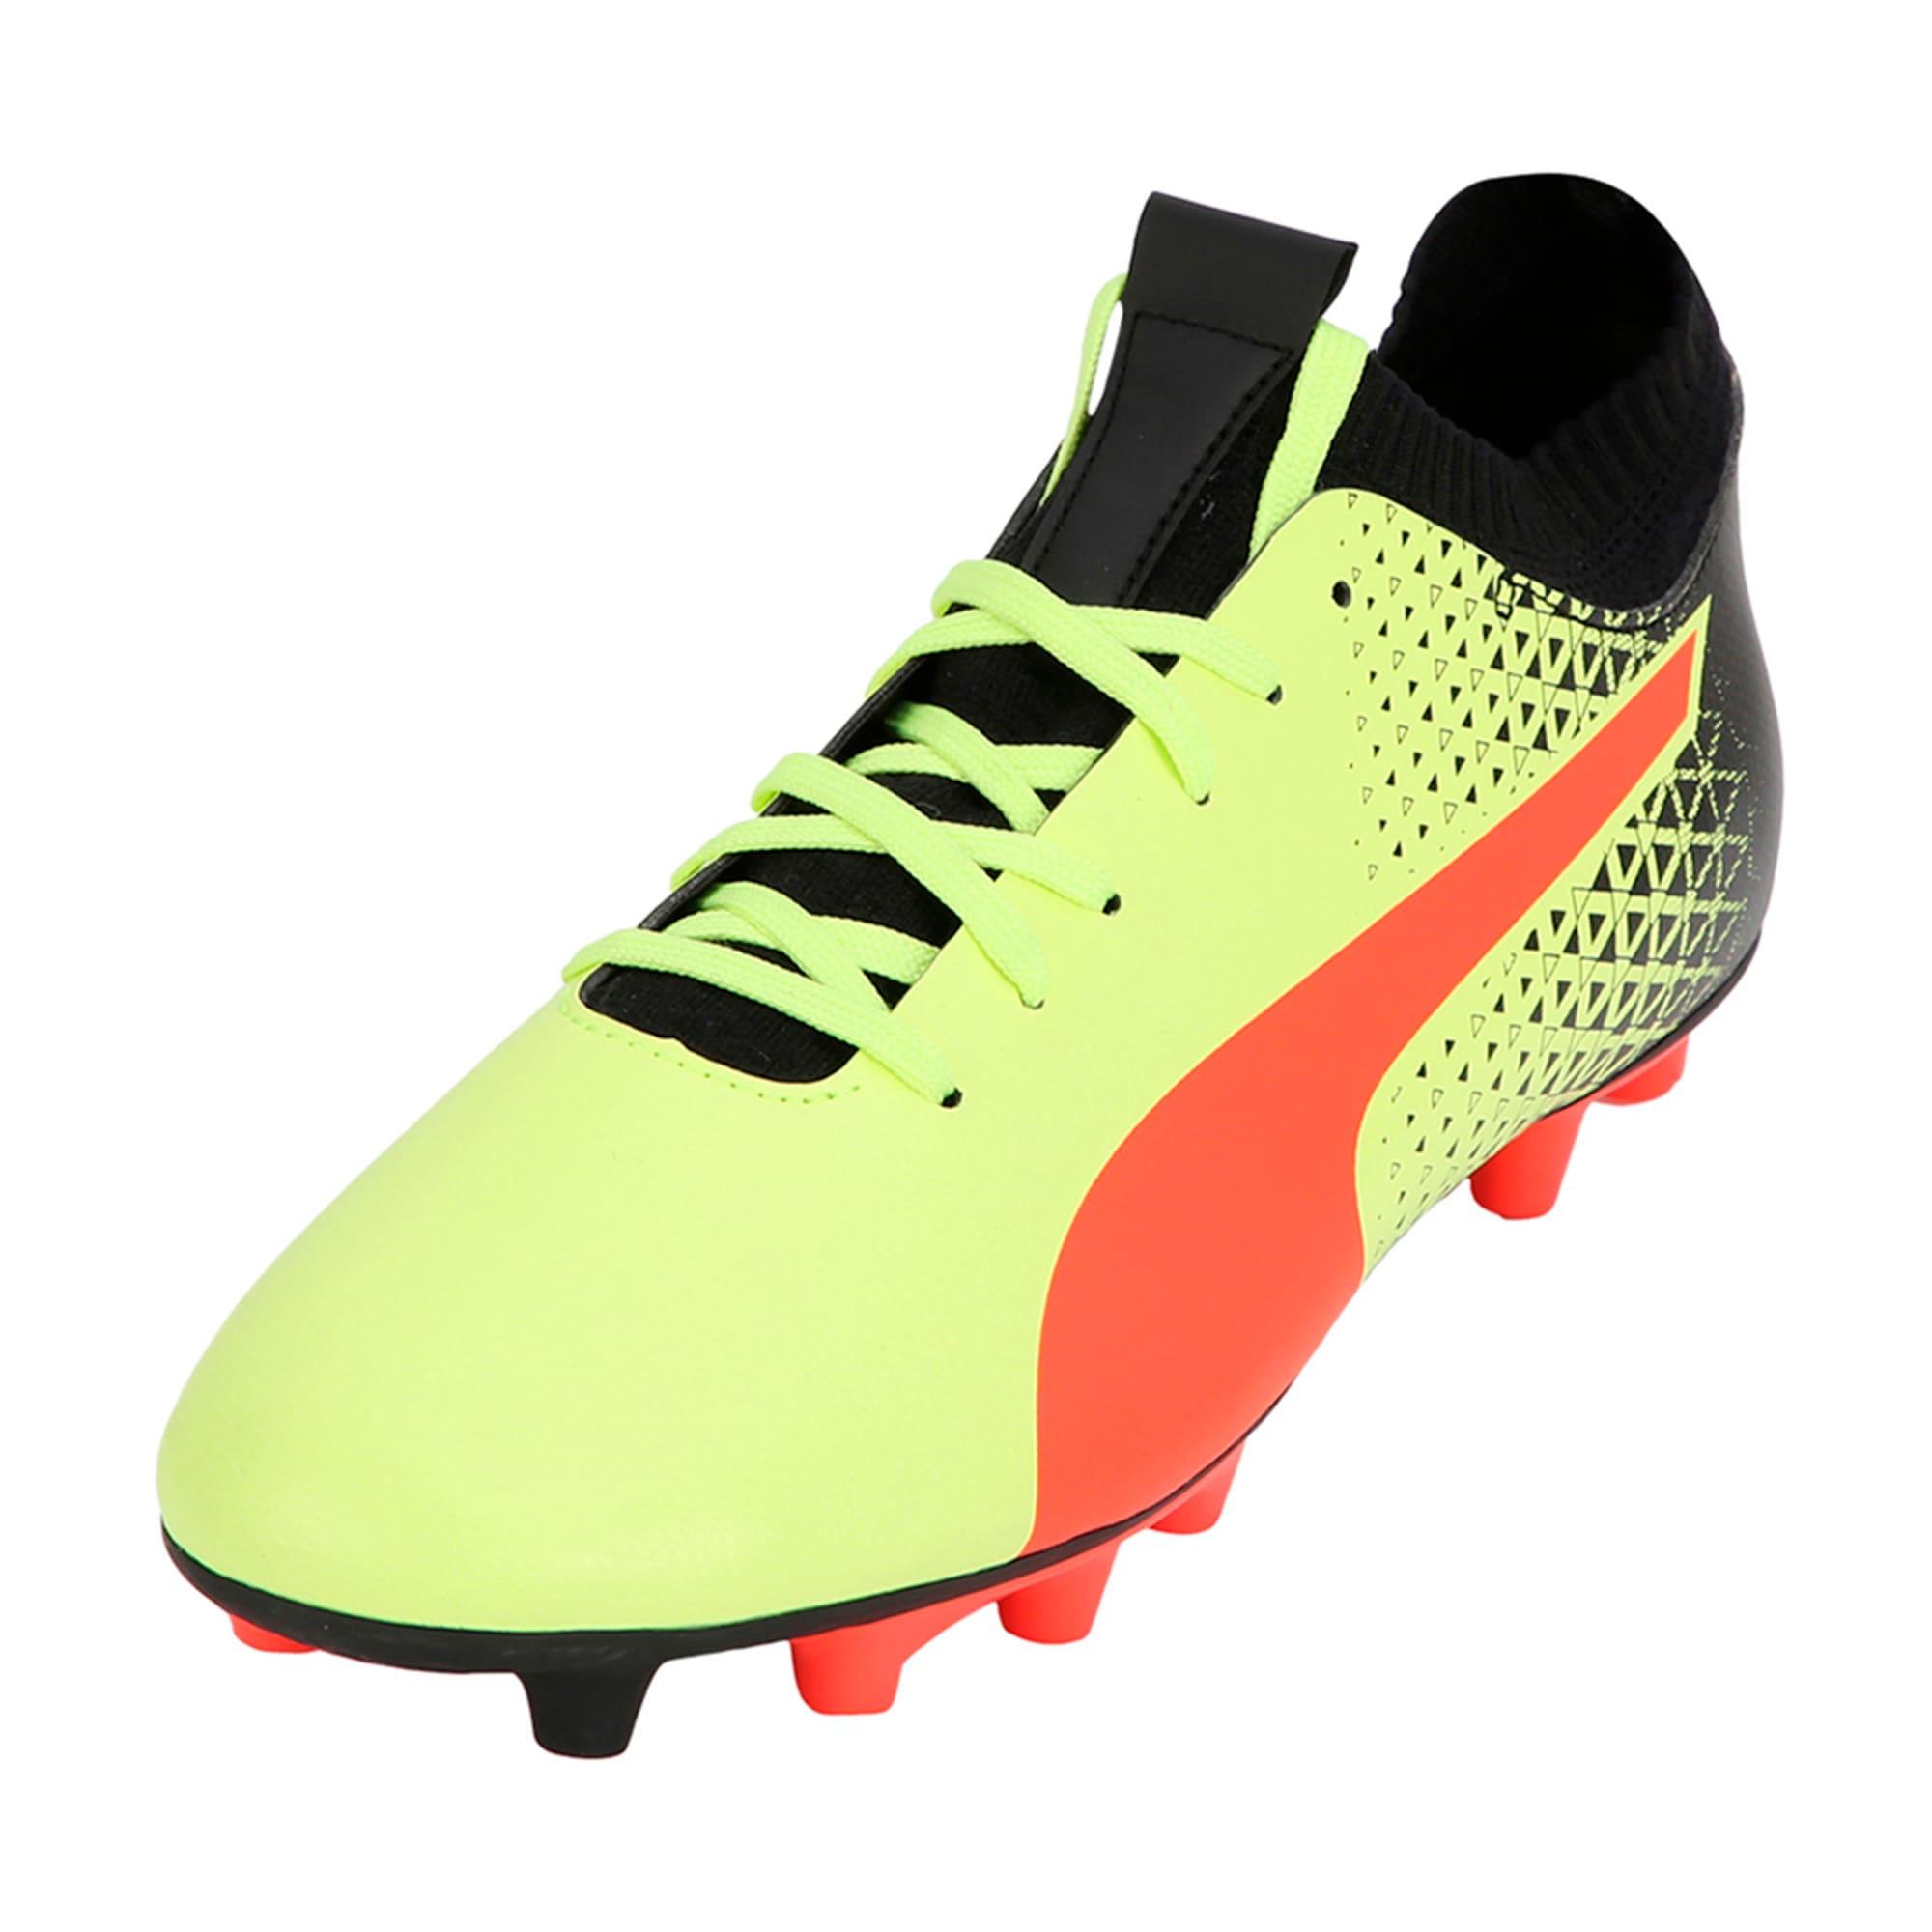 Thumbnail 1 of evoKNIT FG Men's Football Boots, Yellow-Red-Black, medium-IND